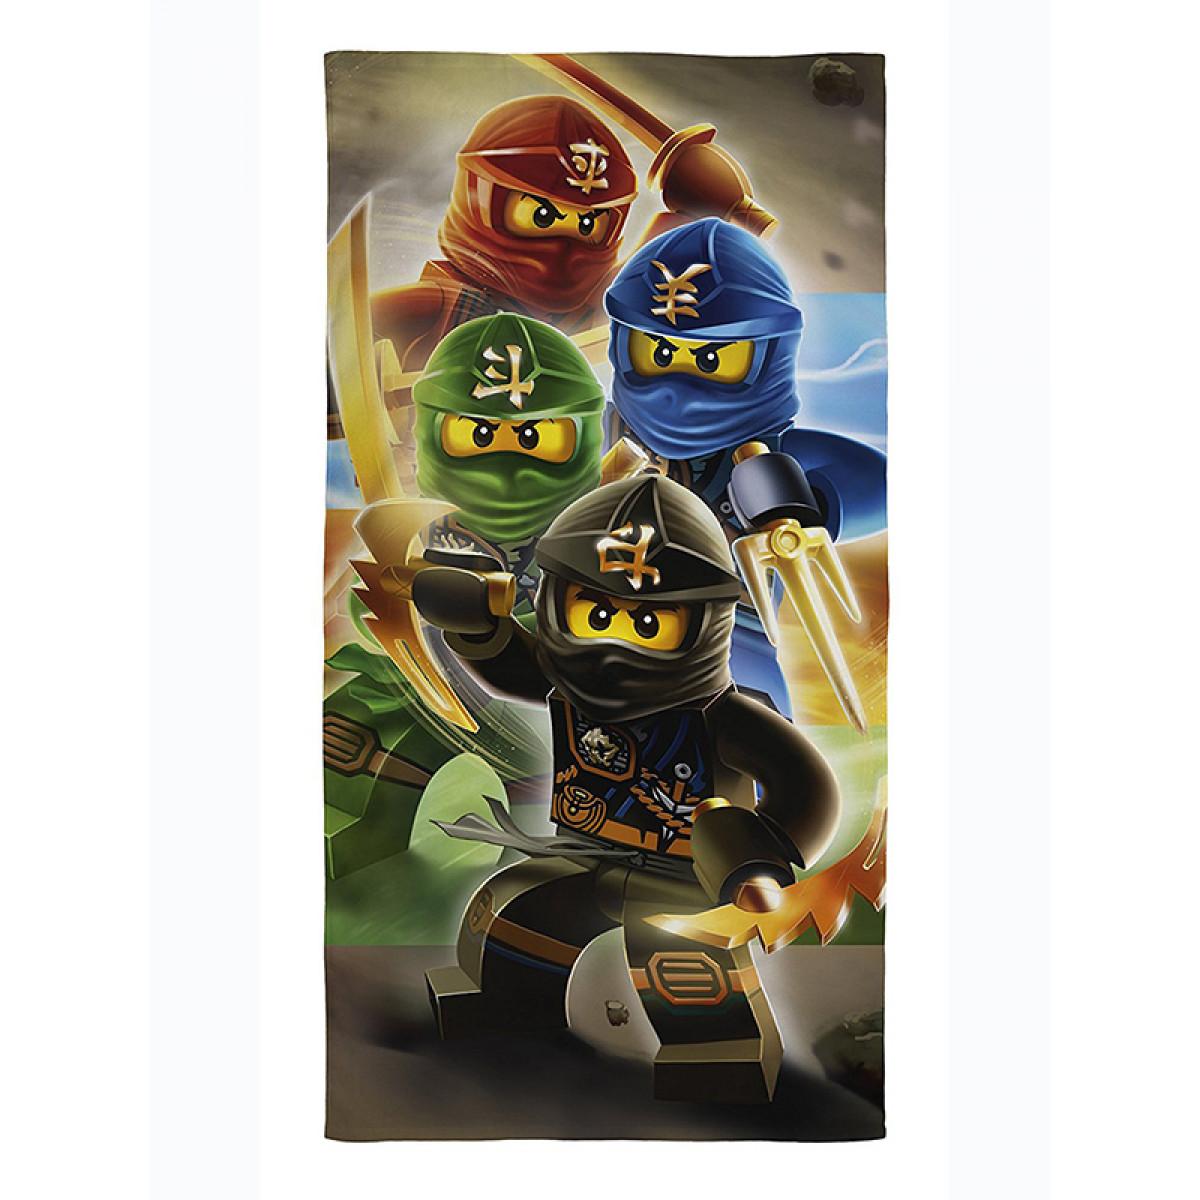 Lego Ninjago Quadrant Towel | Cotton | Beach